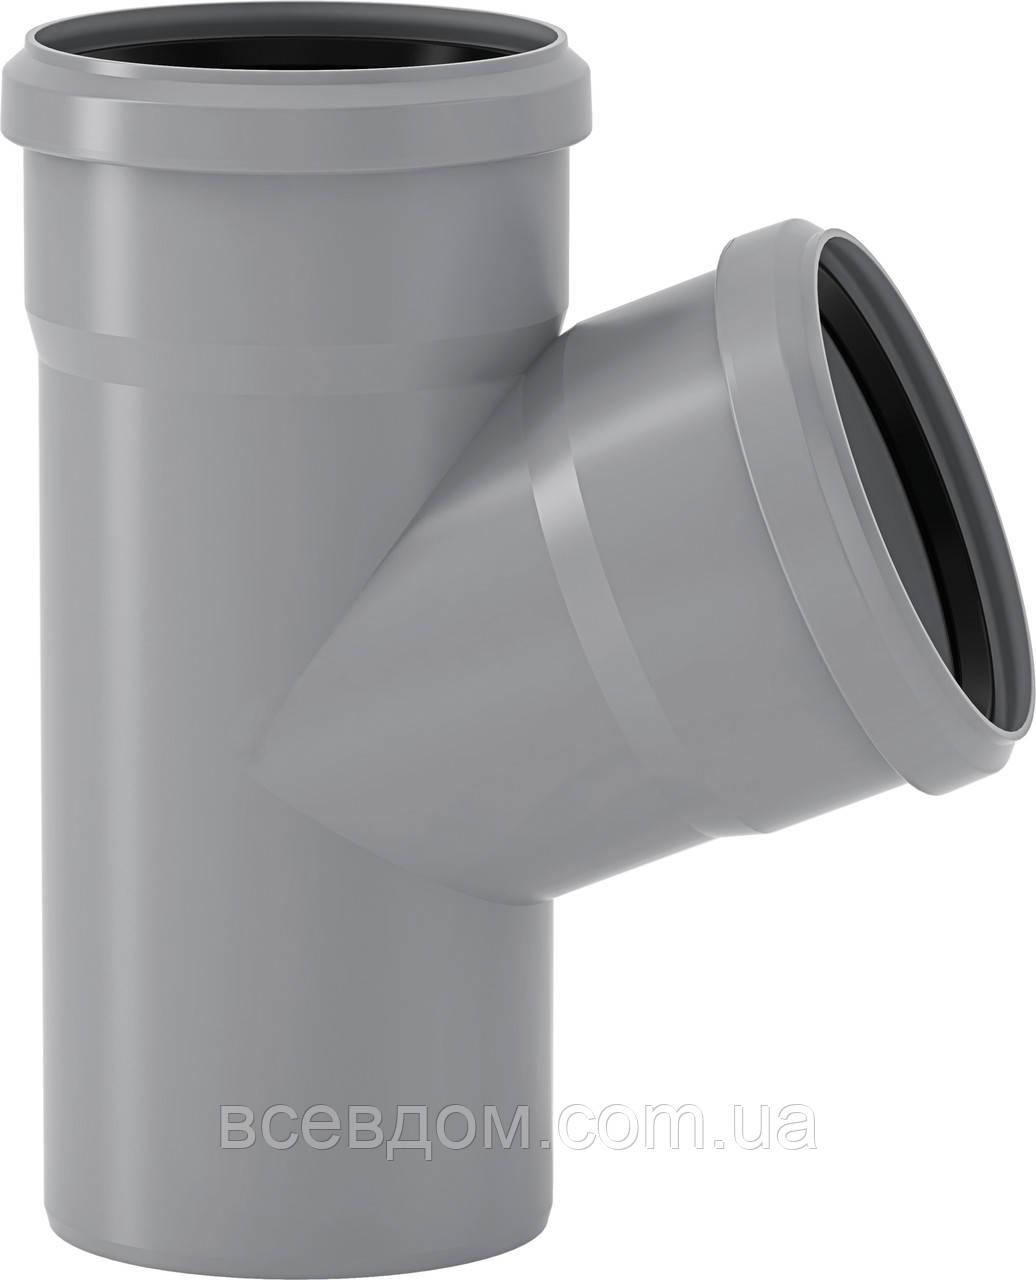 HTEA тройник Valsir внутренней канализации 110/110х67°